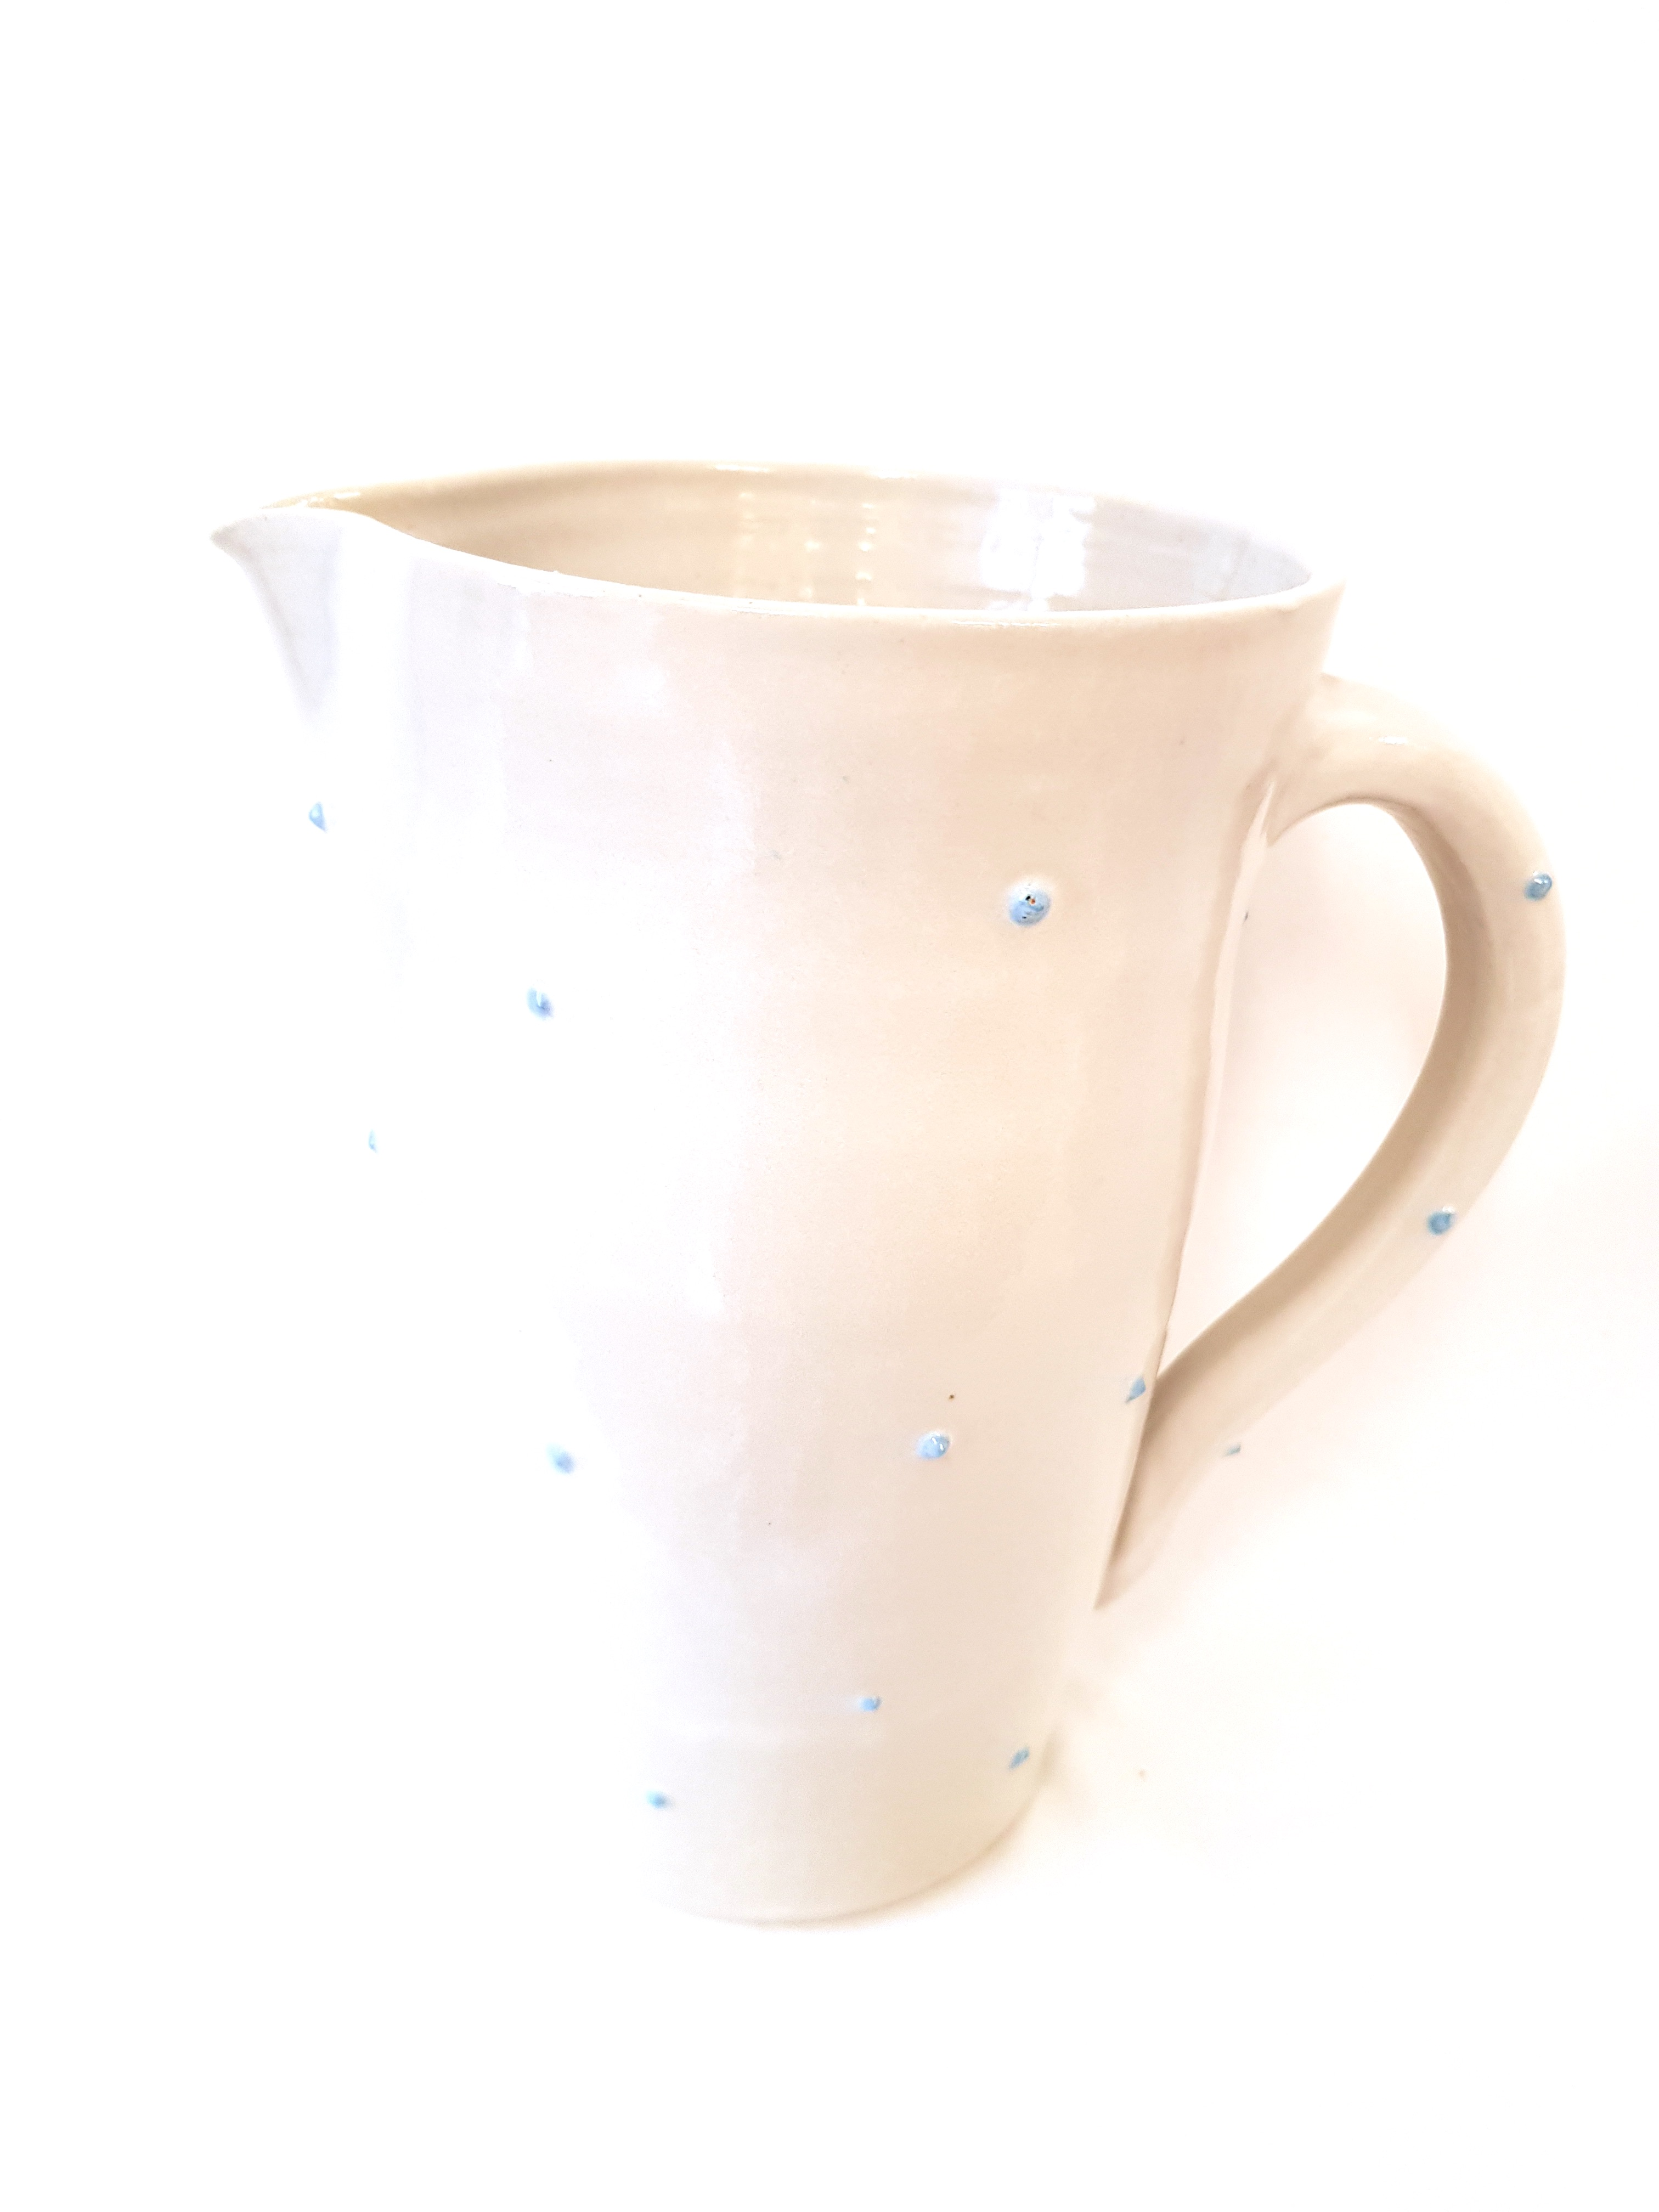 Keramikkrug & Becher, Töpferei la ceramica Basel, Unikat, Töpferkurse, Teamevents, online shop